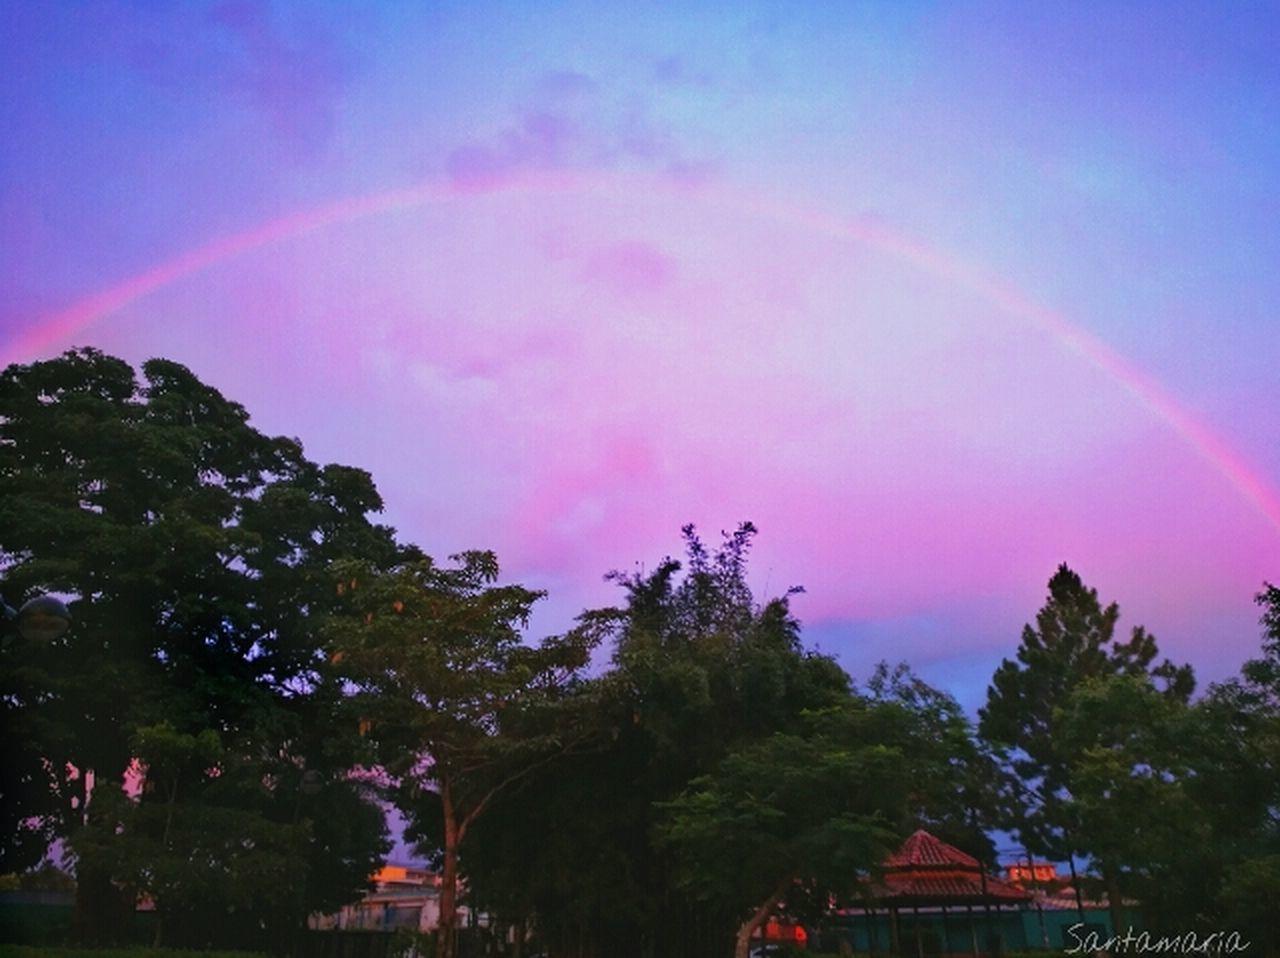 Rainbow! Sunset Outdoors Sky Tree Nature No People Beauty In Nature Raimbow Rainbow Sky Scenics Costa Rica Pura Vida ✌ Enjoying Life Costarica2016 Cloud - Sky